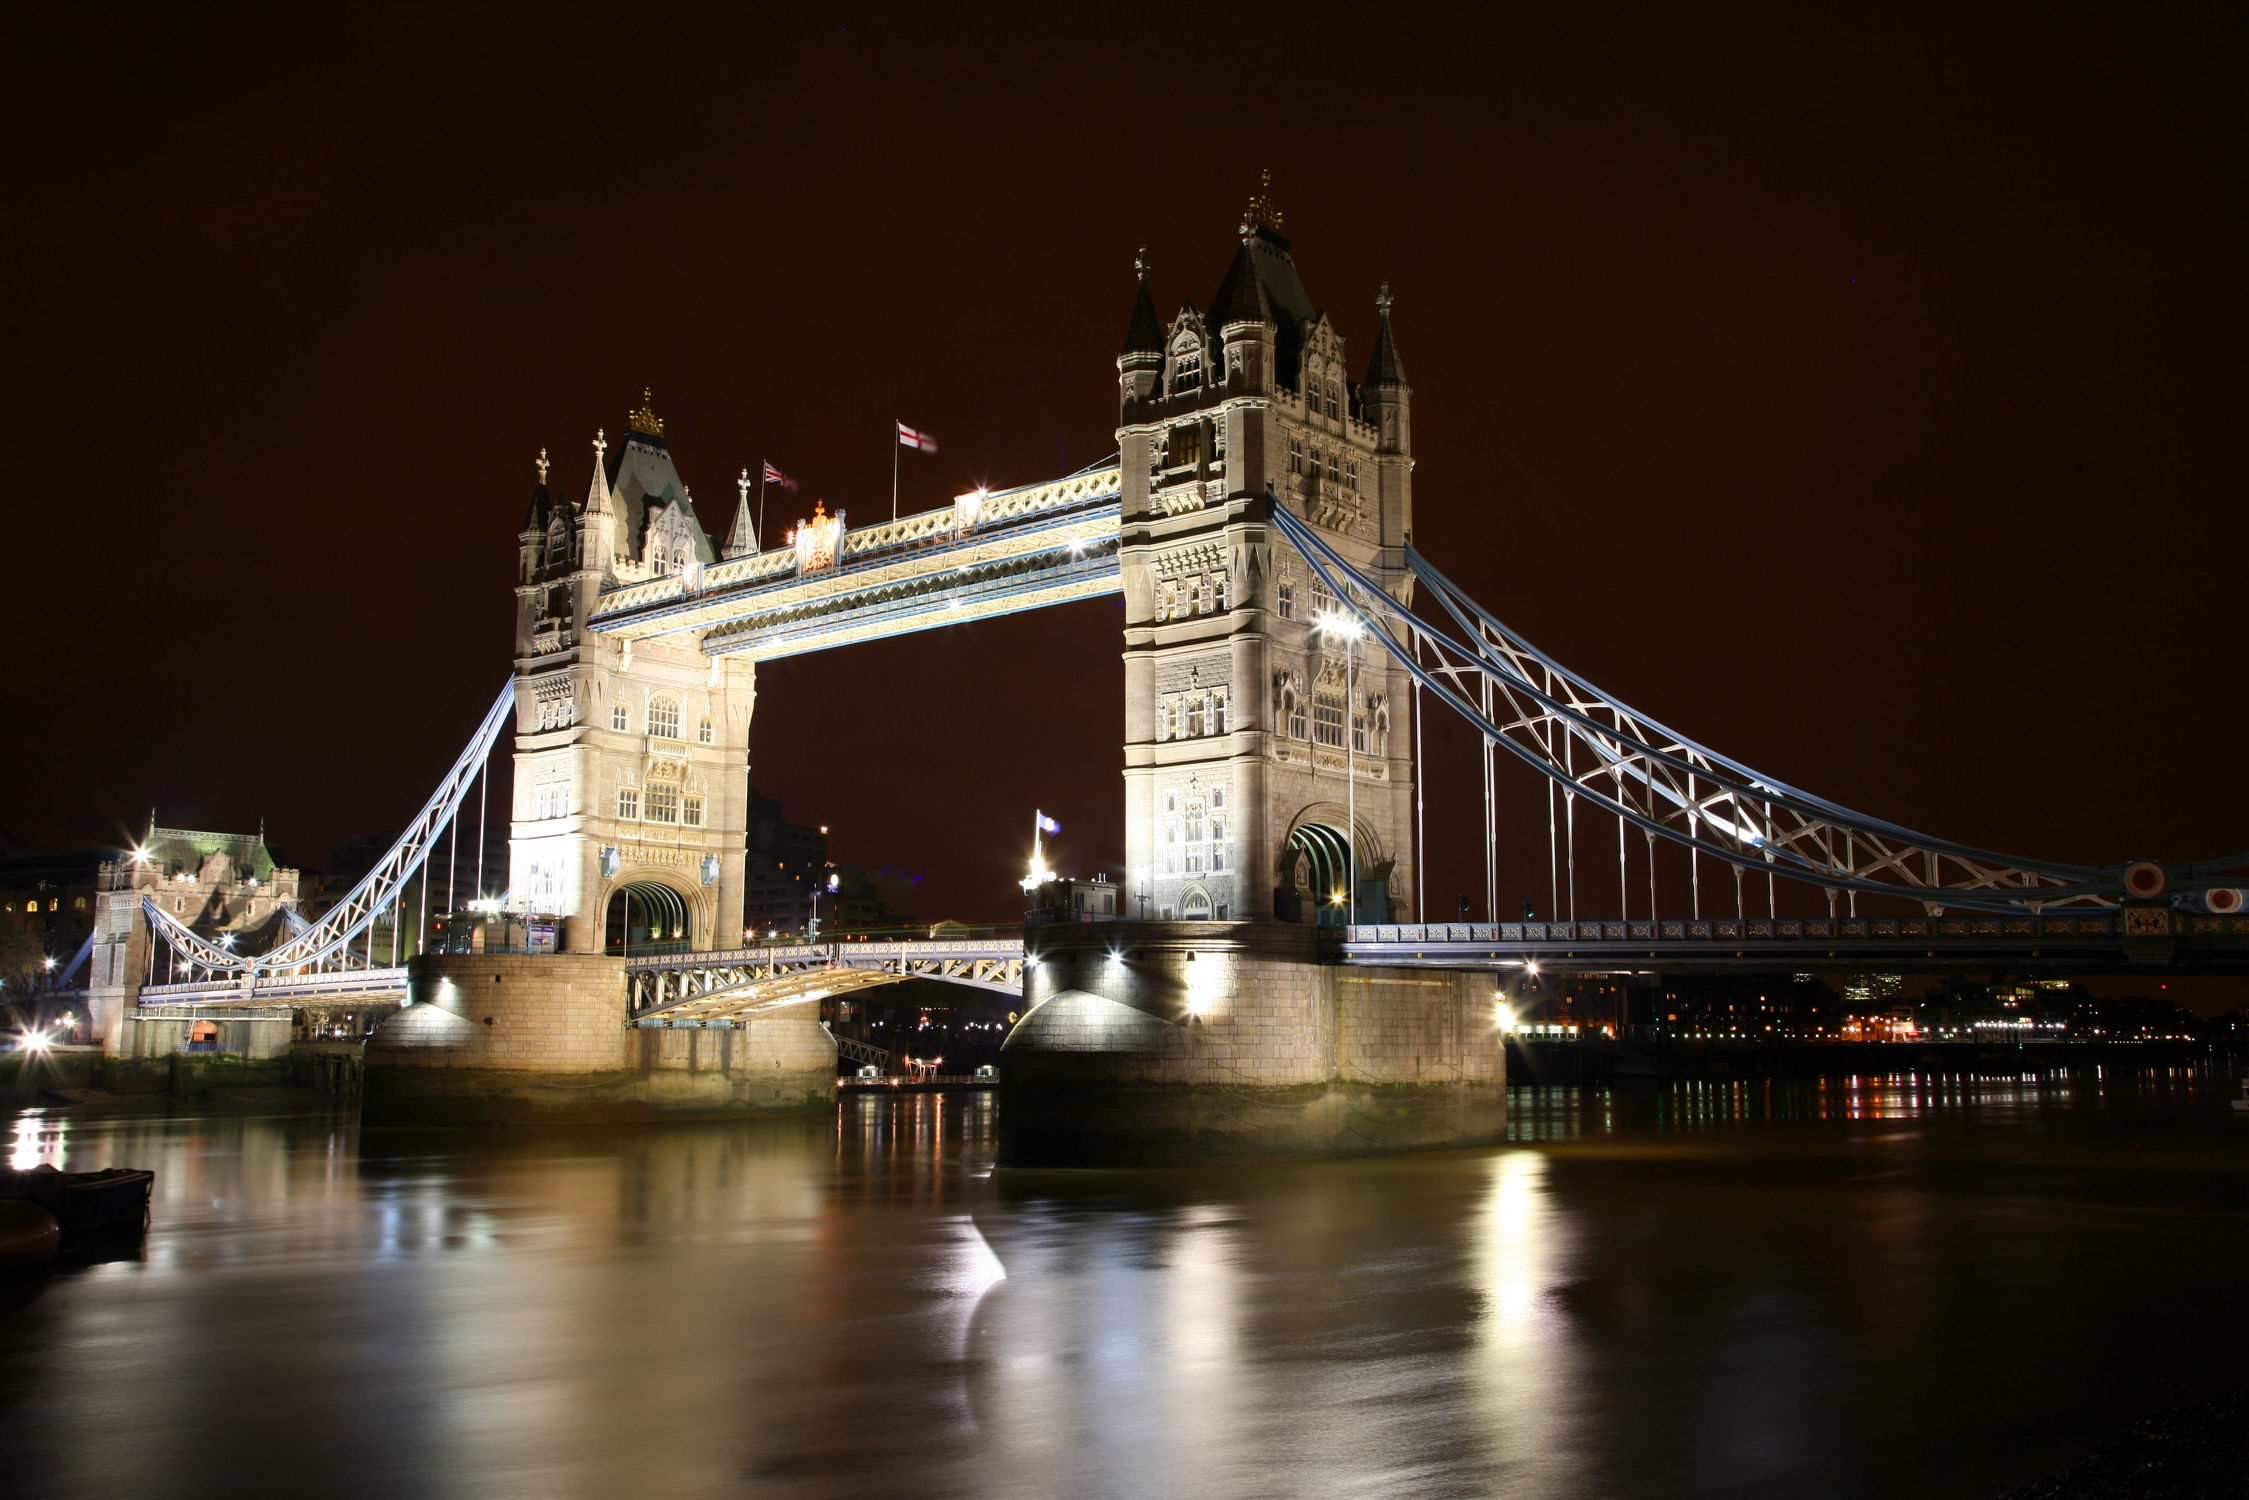 Bild mit Städte, England, London, Stadt, London Bridge, City, Nachtaufnahmen, Nacht, london tower bridge, Skyline, Stadtleben, night